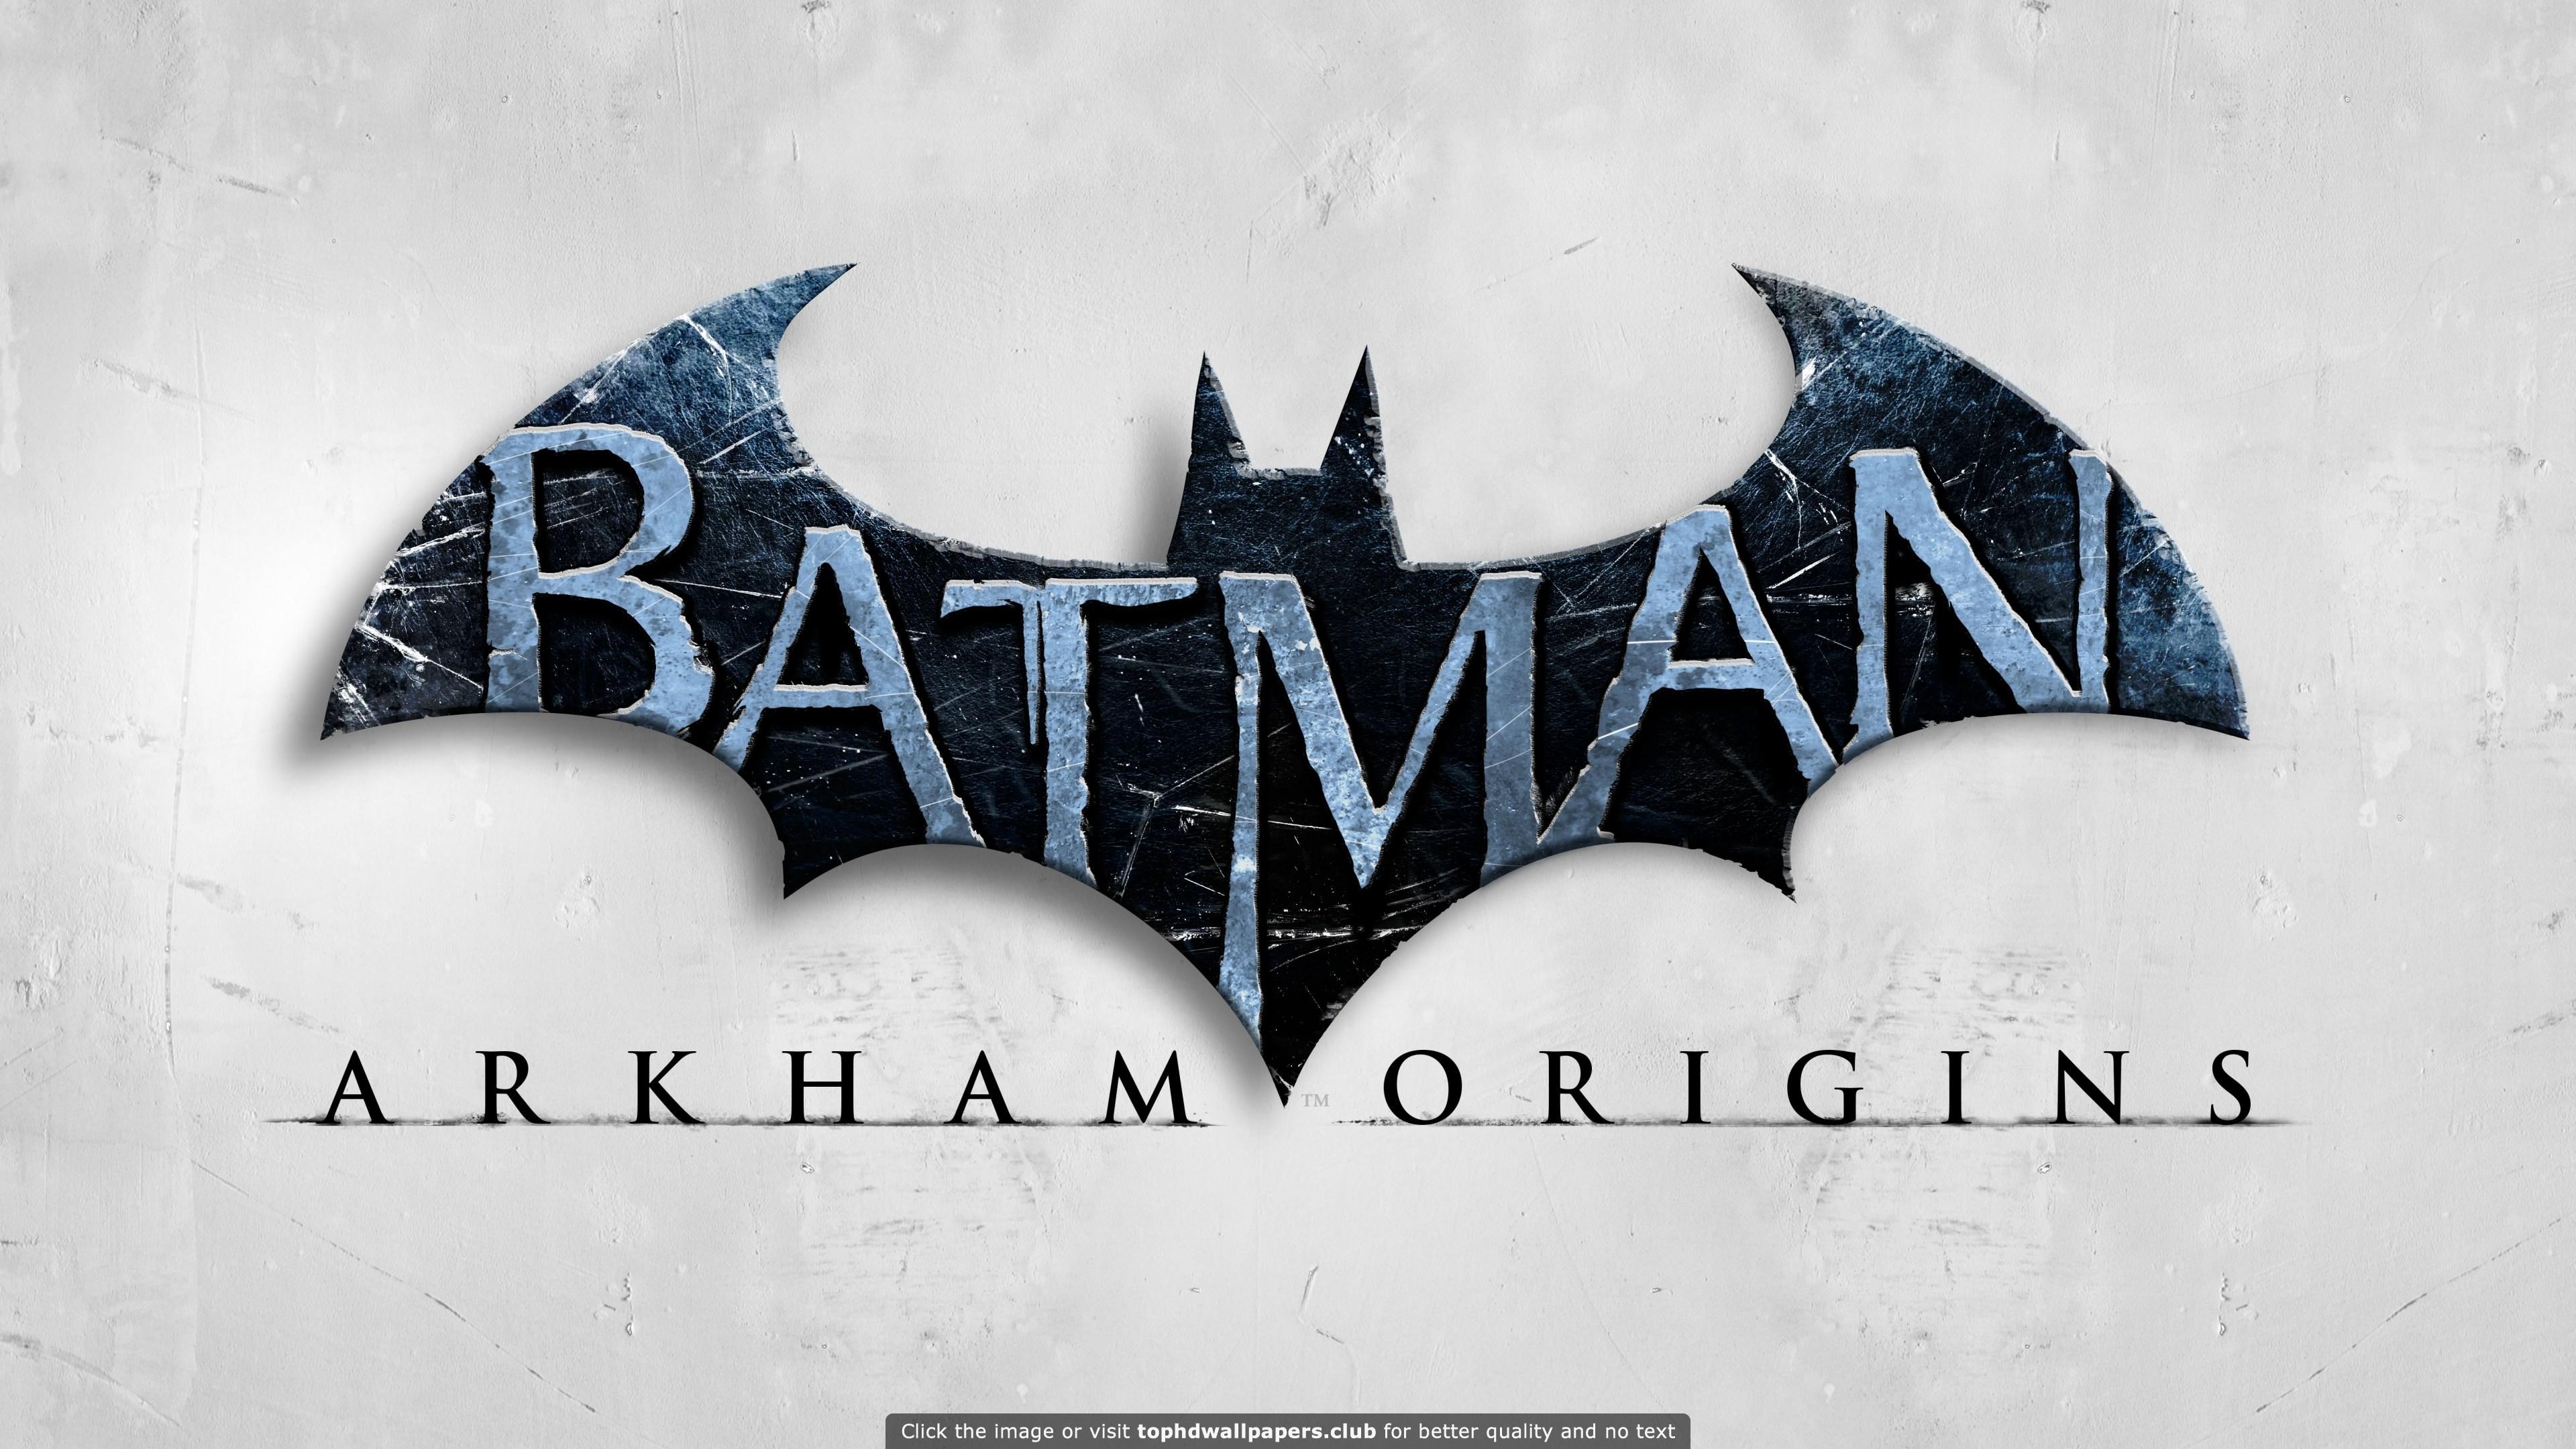 Batman Arkham Origins HD wallpaper for your PC, Mac or Mobile device